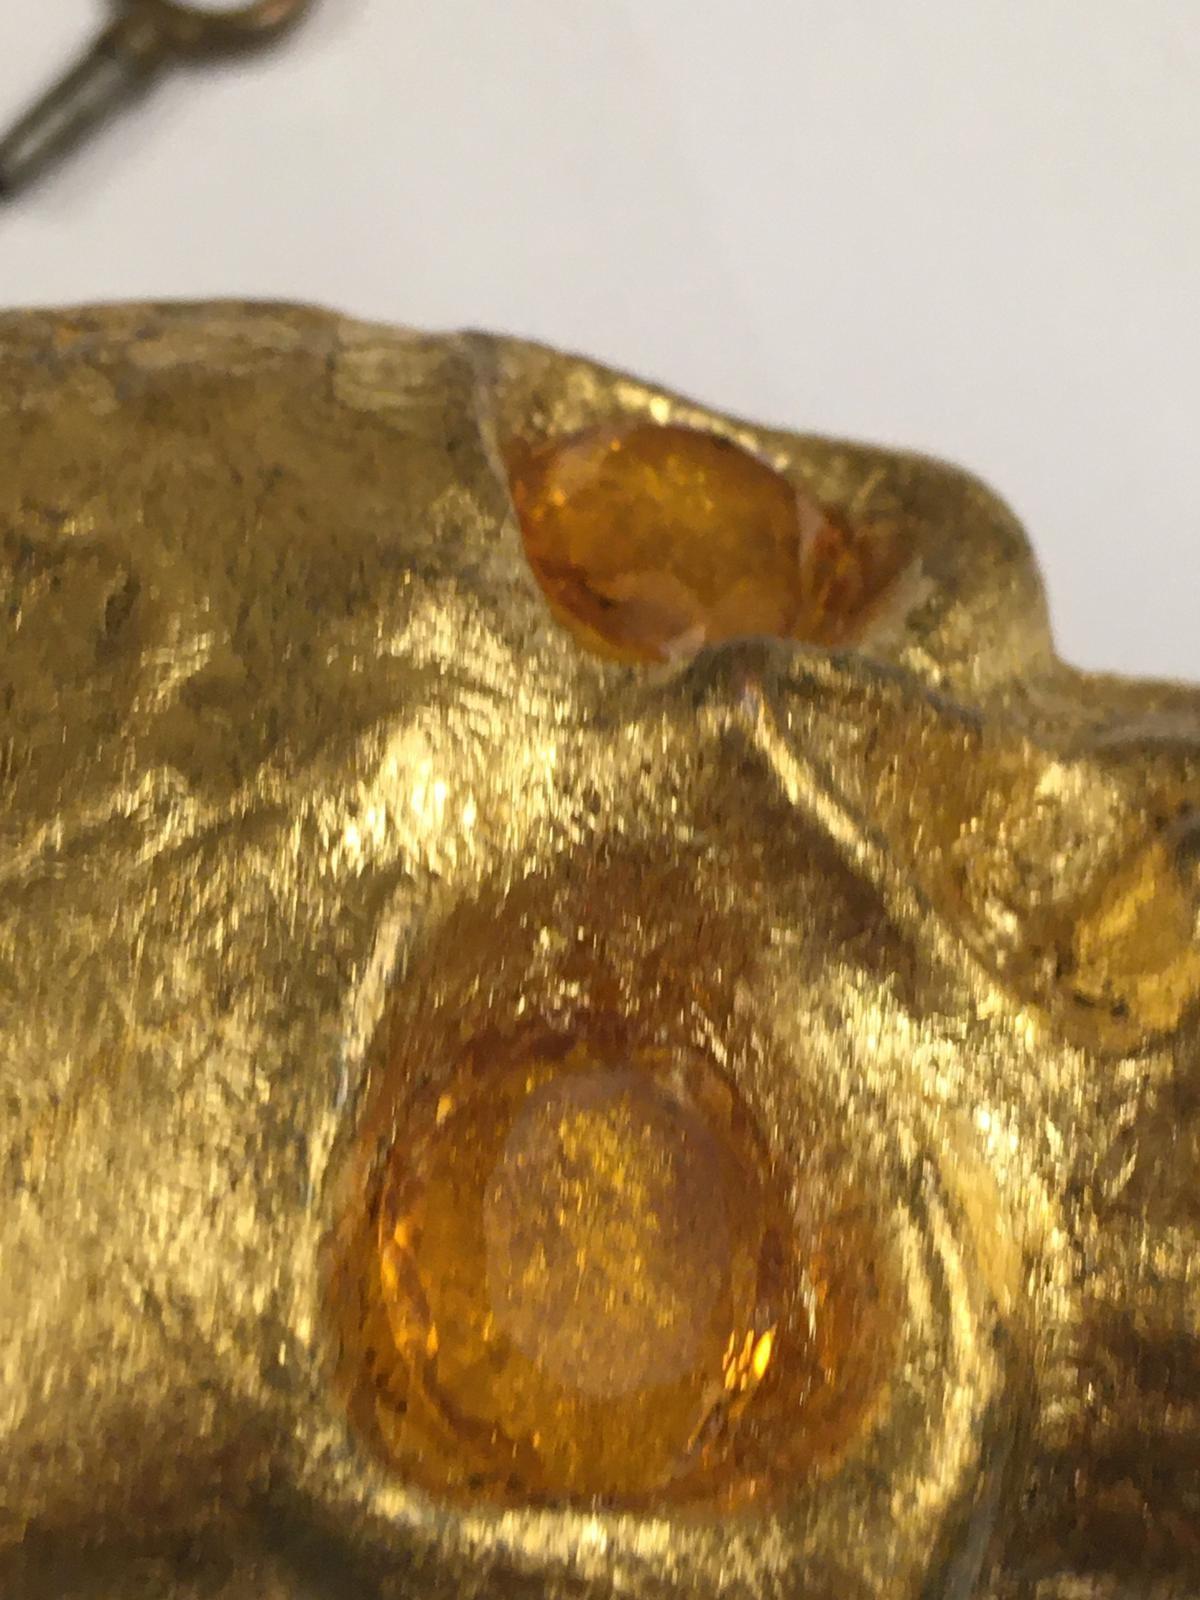 Antique 19th century Masonic memento mori Pocket watch movement timepiece . ( working ) skull with - Image 4 of 8